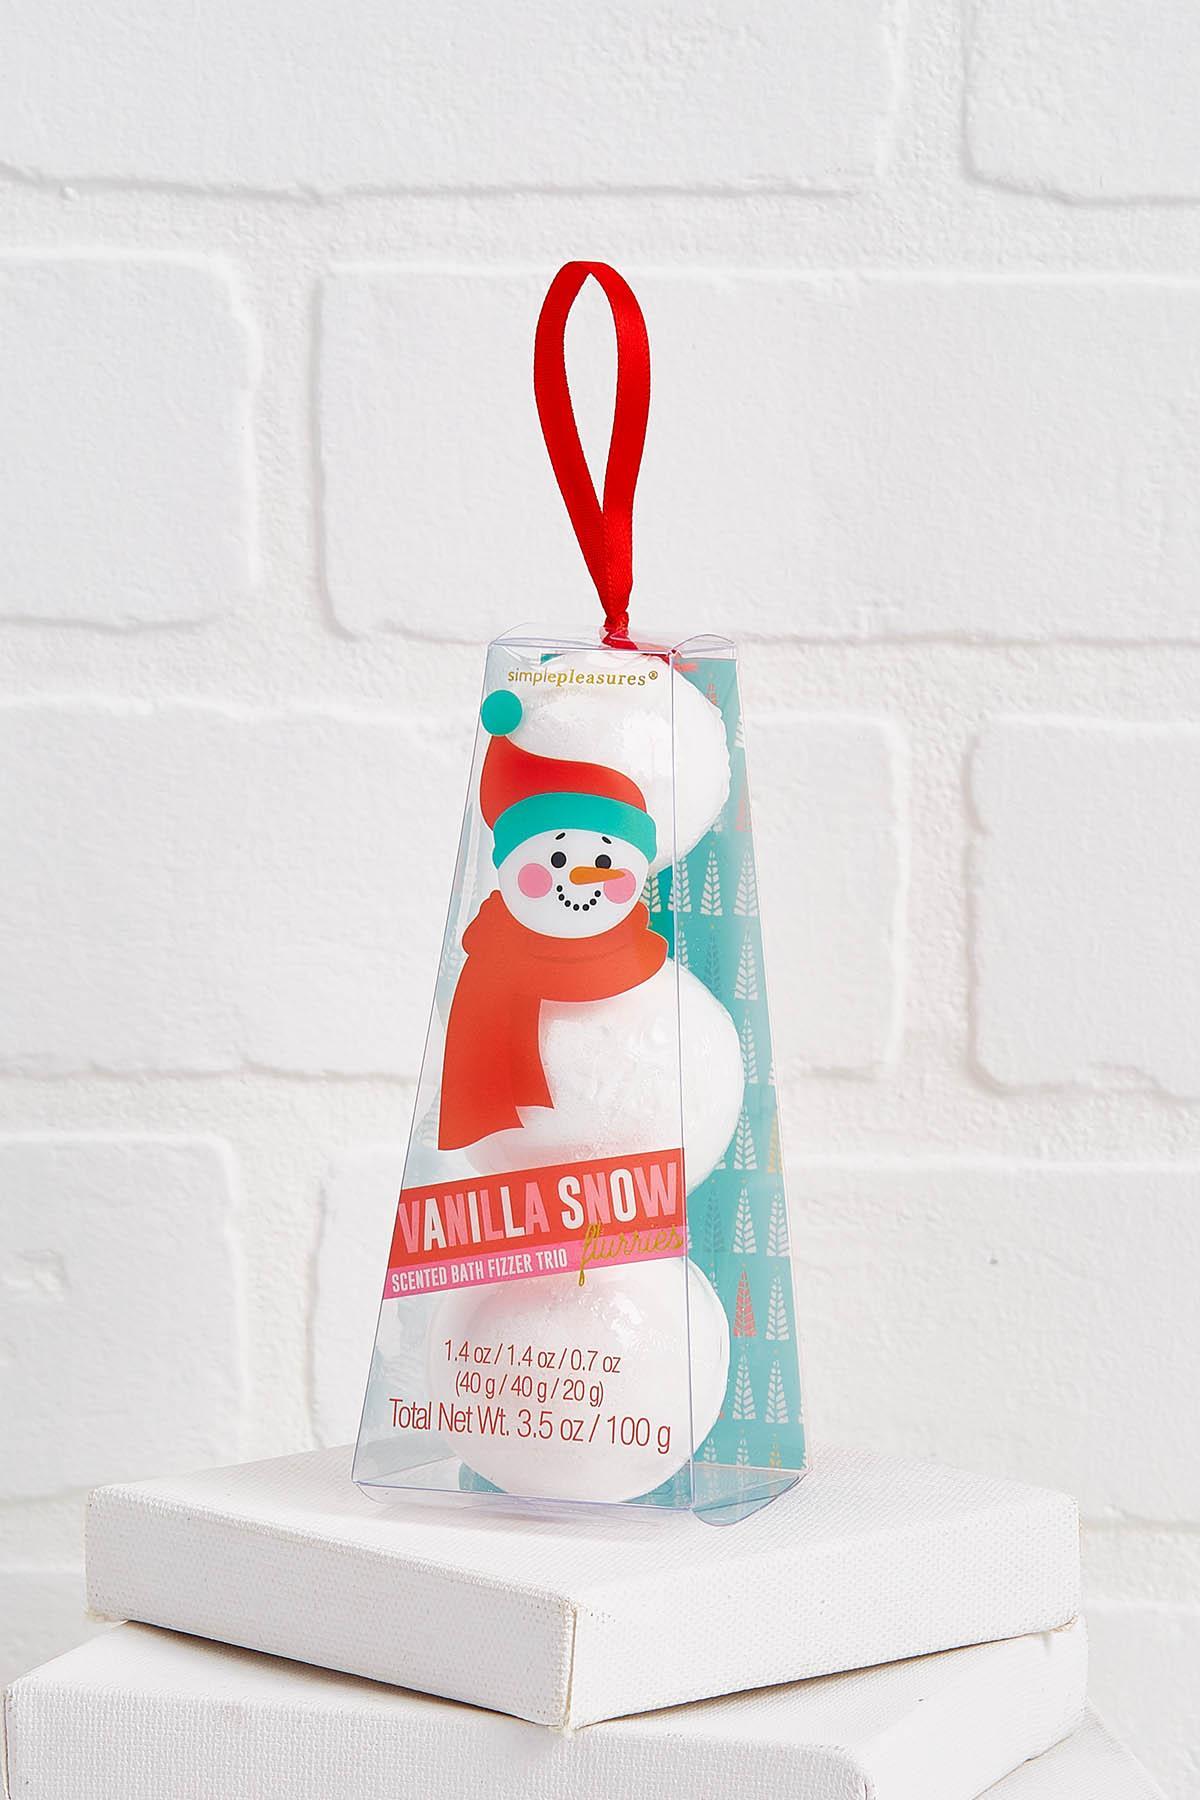 Vanilla Snow Bath Fizzies